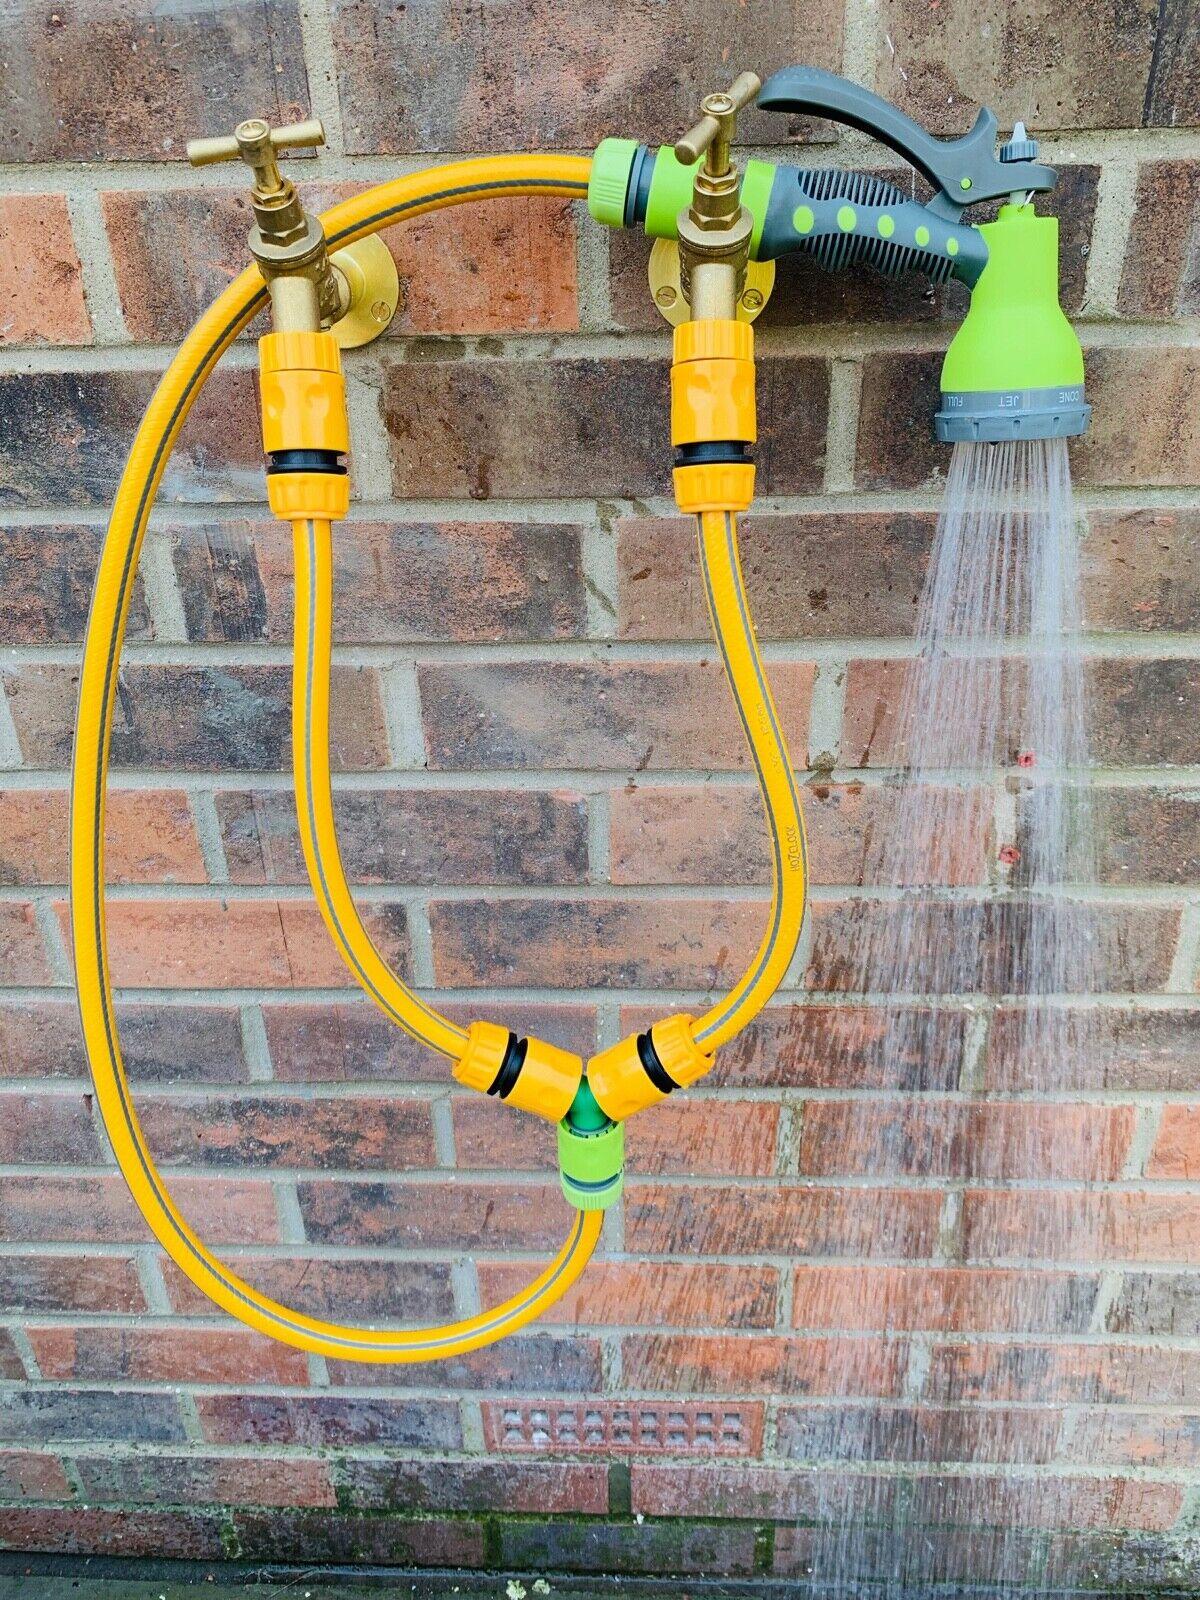 Outdoor Tap Hose Temperature Mixer: Muddy dog wash shower car bike pool